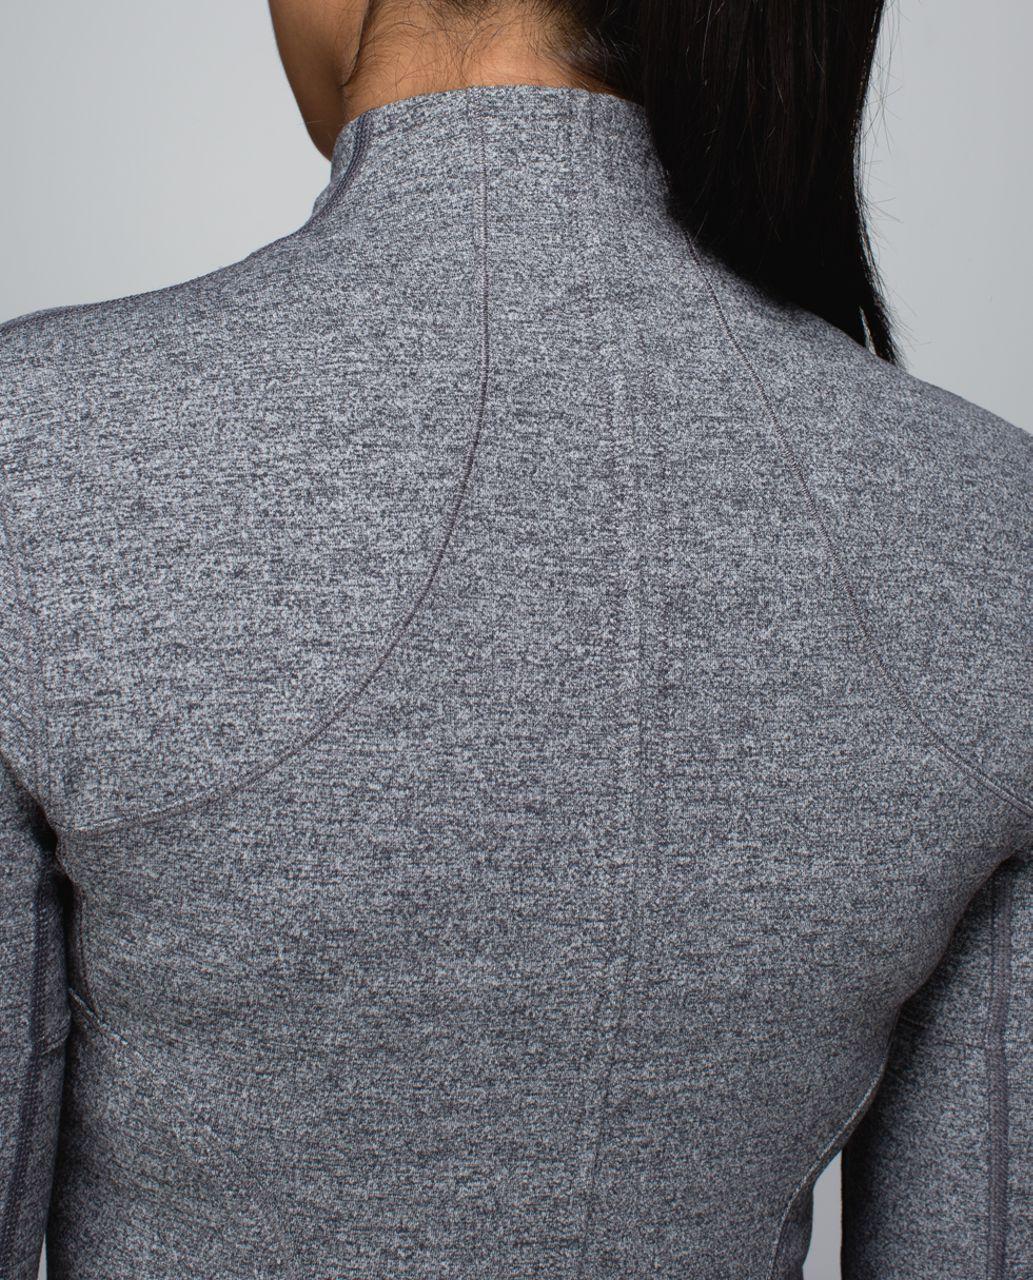 Lululemon Forme Jacket (Cuffins) - Heathered Deep Coal